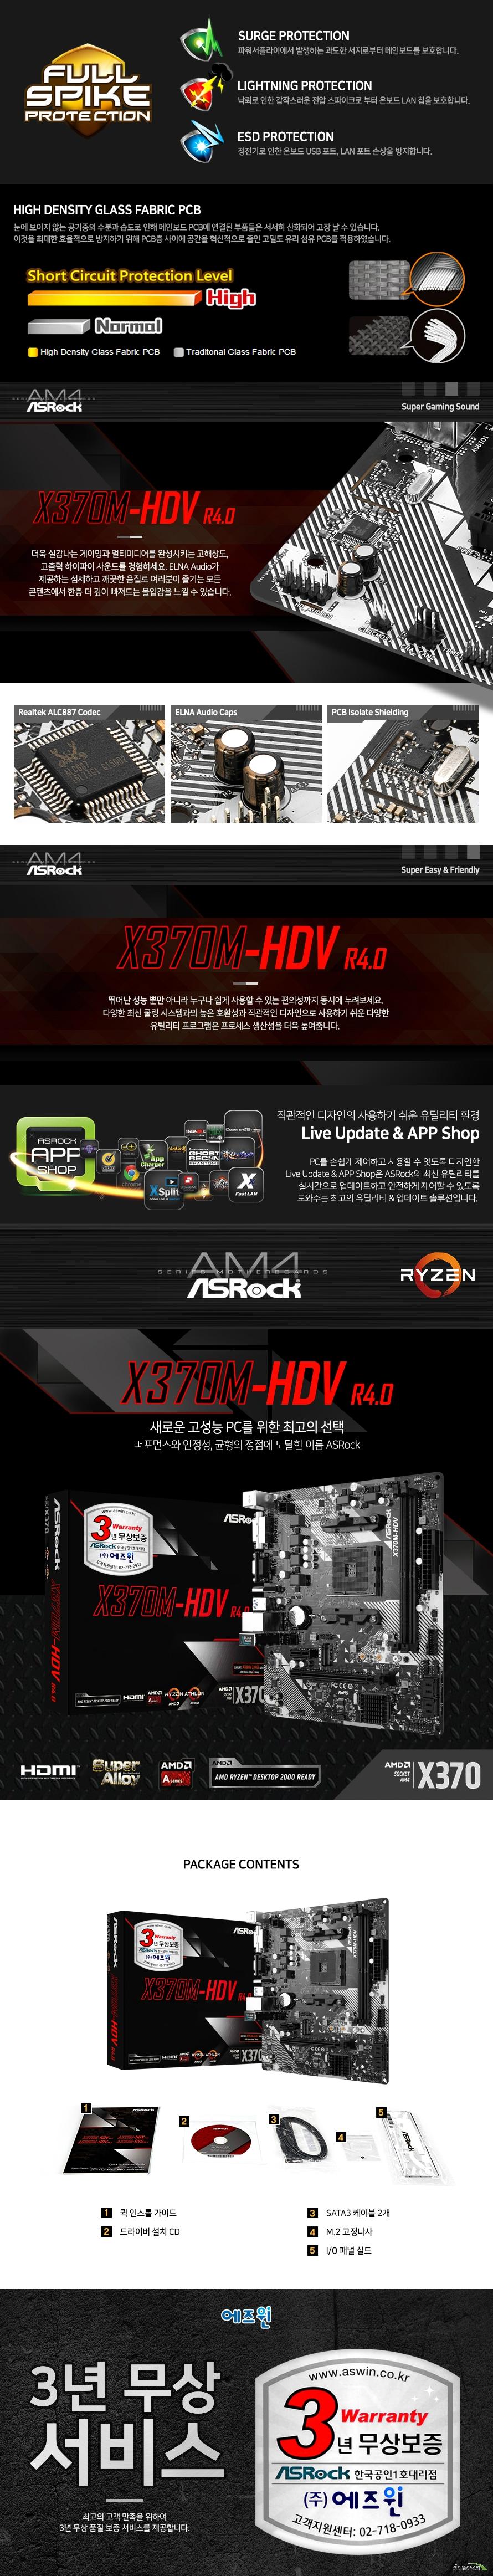 ASRock  X370M-HDV R4.0 에즈윈